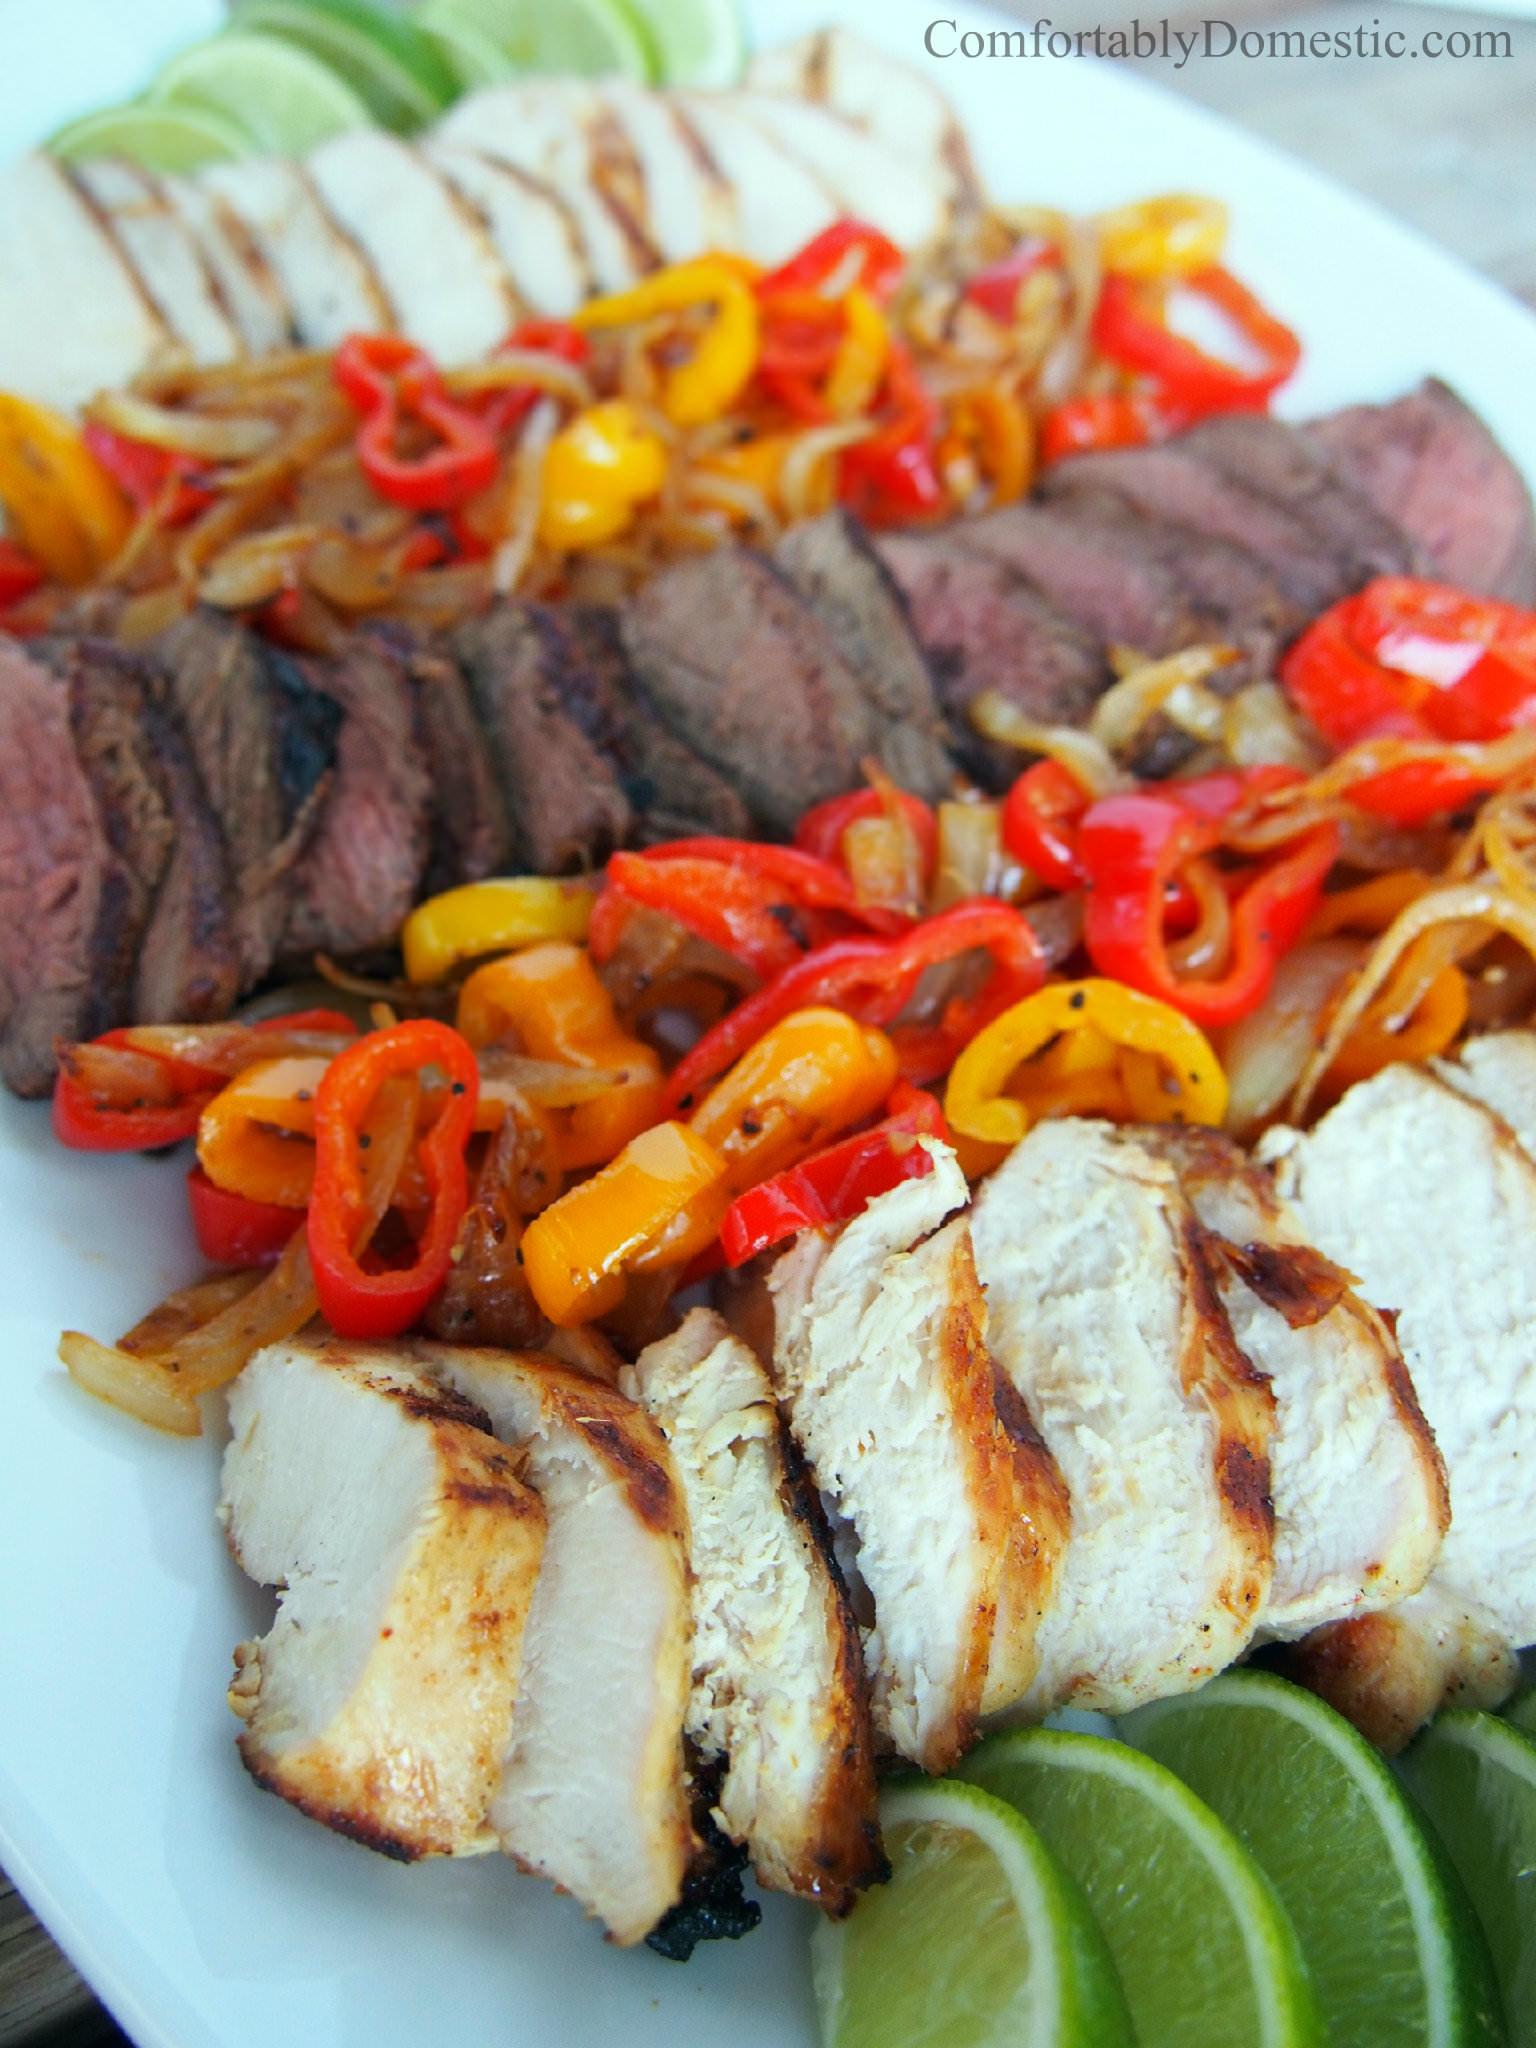 Grilled Chicken Faitas or Steak Fajitas | ComfortablyDomestic.com